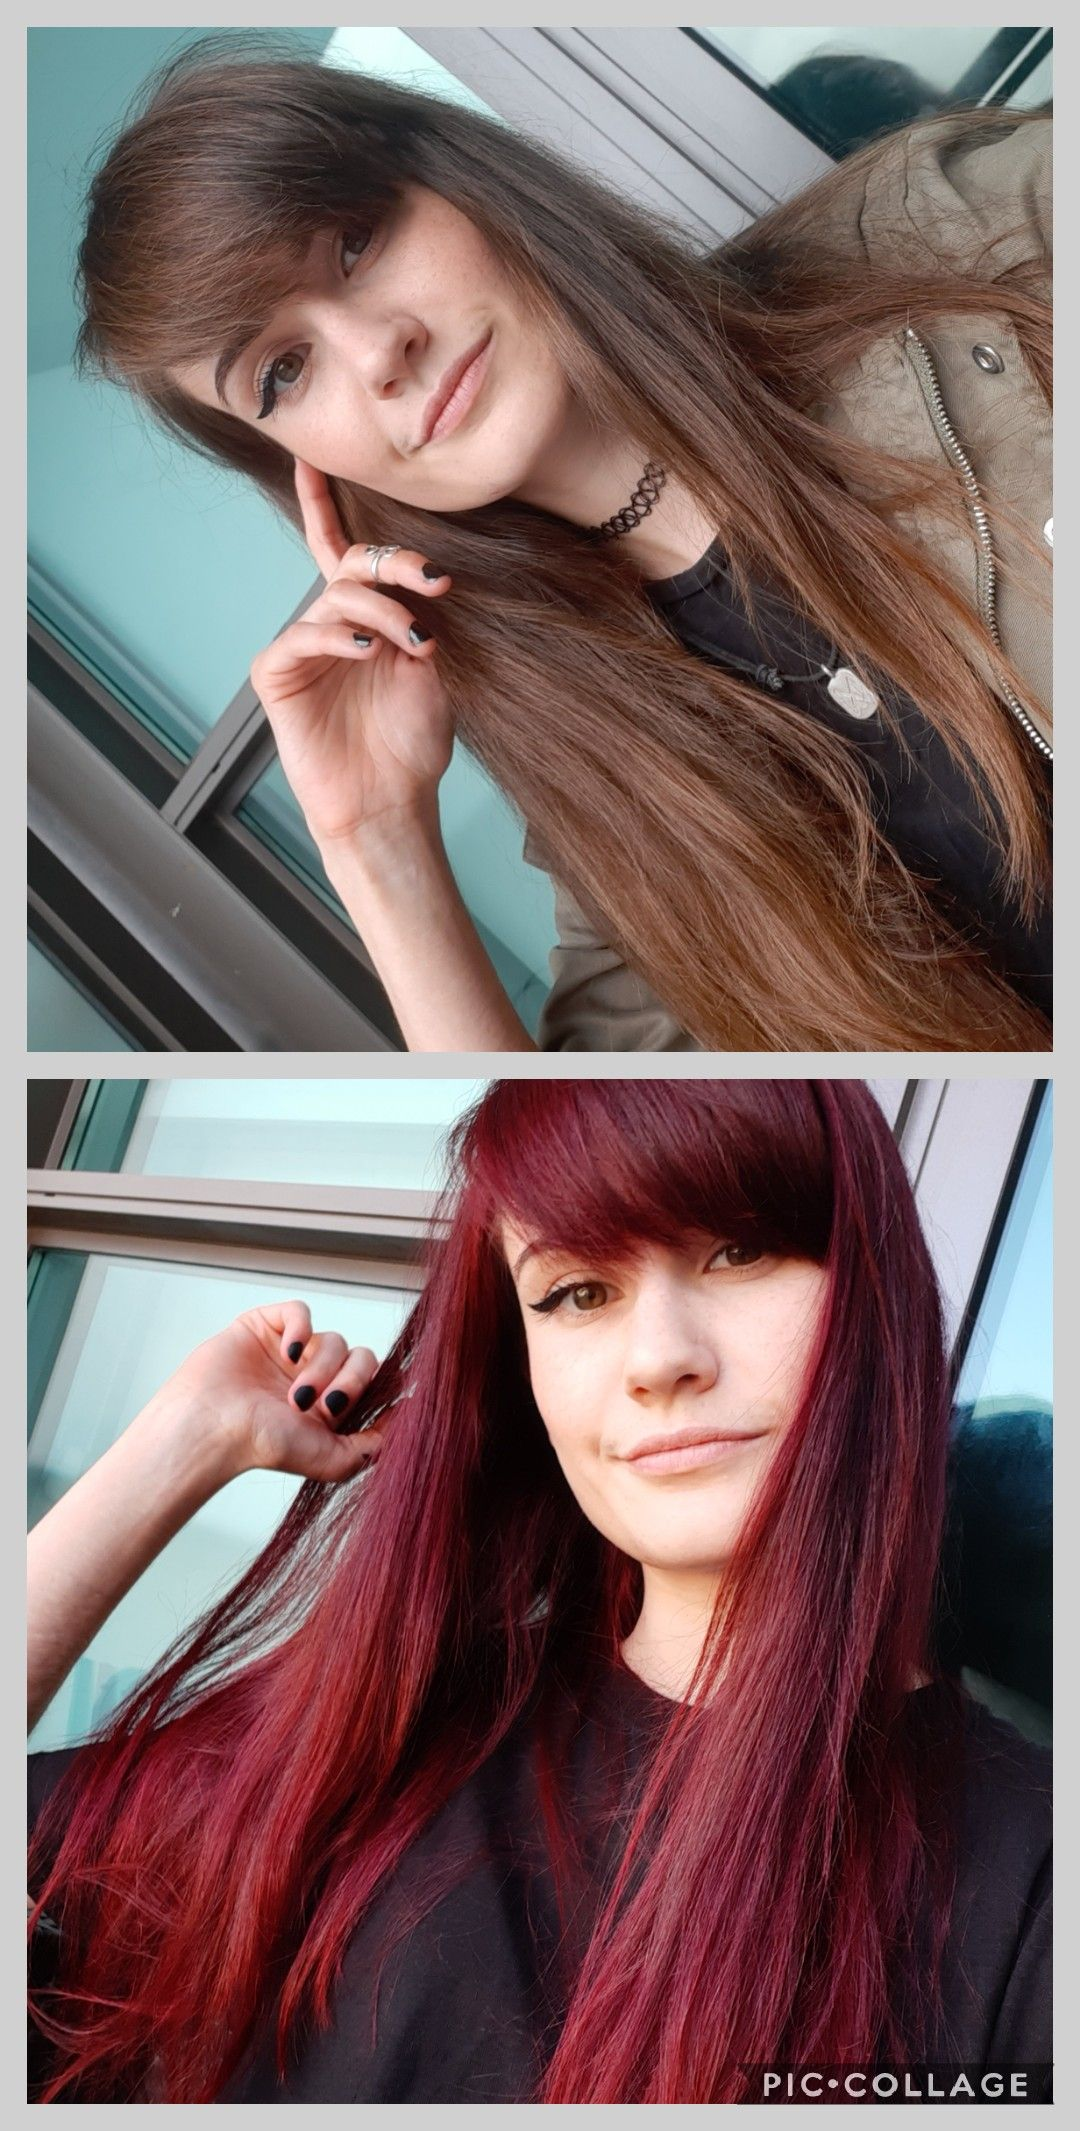 Diy Manic Panic Vampire Red Without Bleach Hair Beauty Skin Deals Me Fashion Love Manic Panic Vampire Red Manic Panic Hair Dye Red Hair Without Bleach